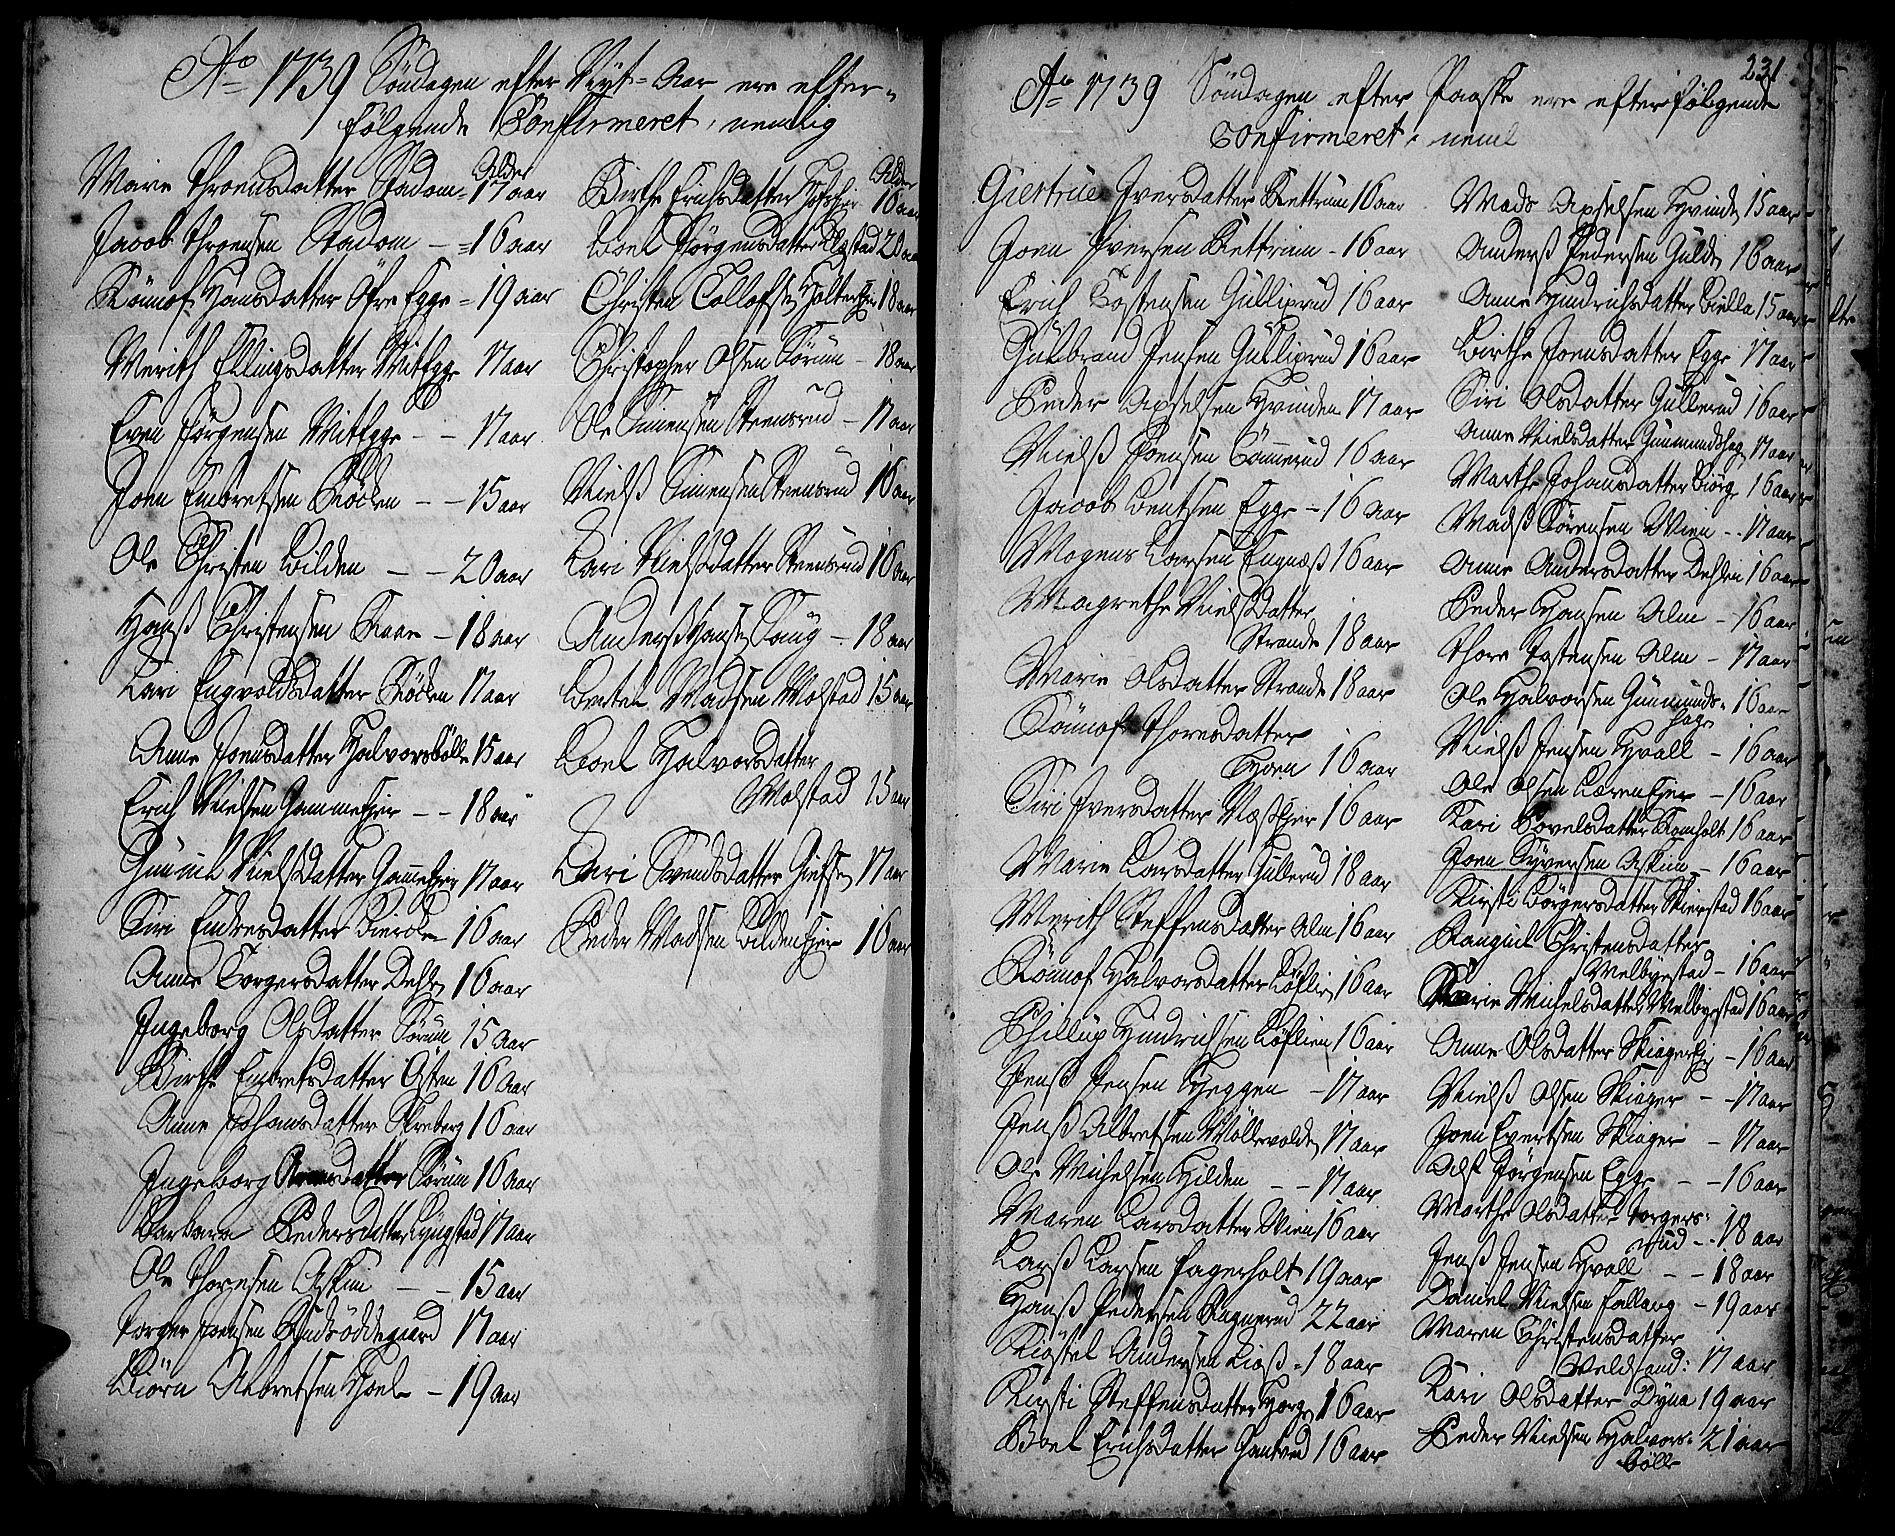 SAH, Gran prestekontor, Ministerialbok nr. 2, 1732-1744, s. 231